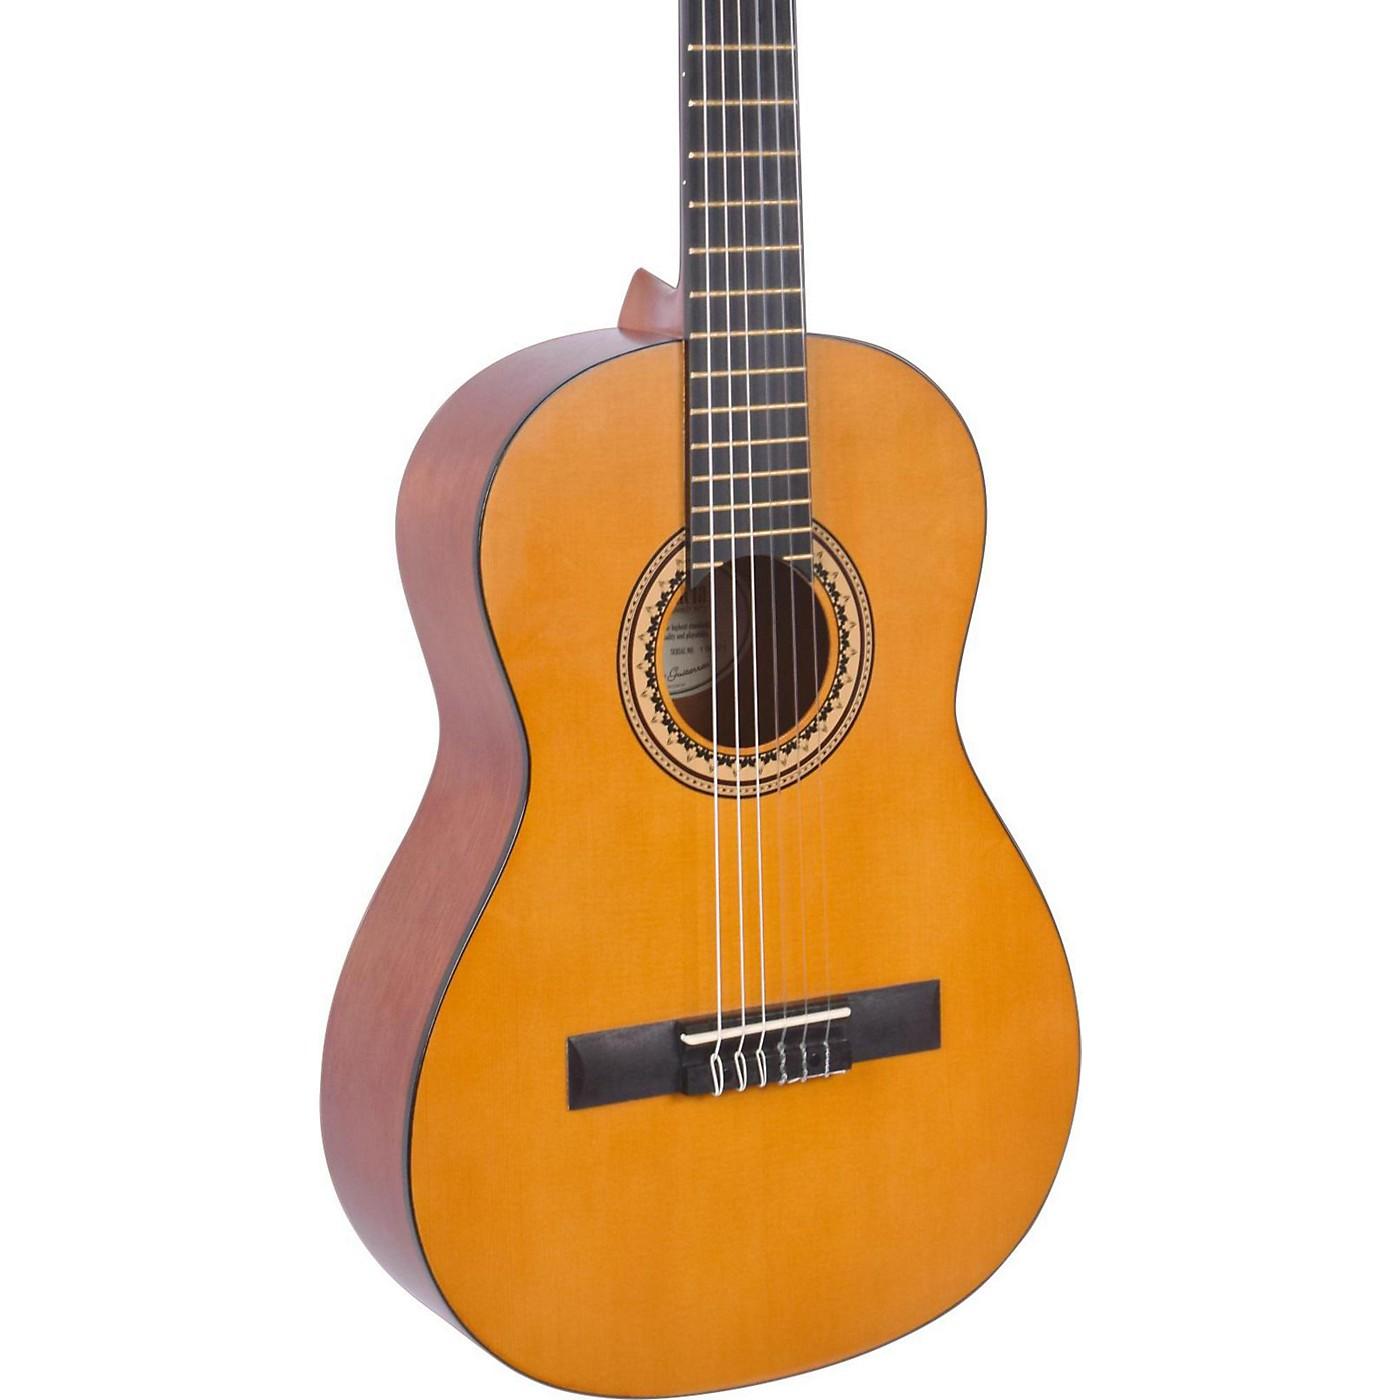 Valencia 200 Series 3/4 Size Classical Acoustic Guitar thumbnail